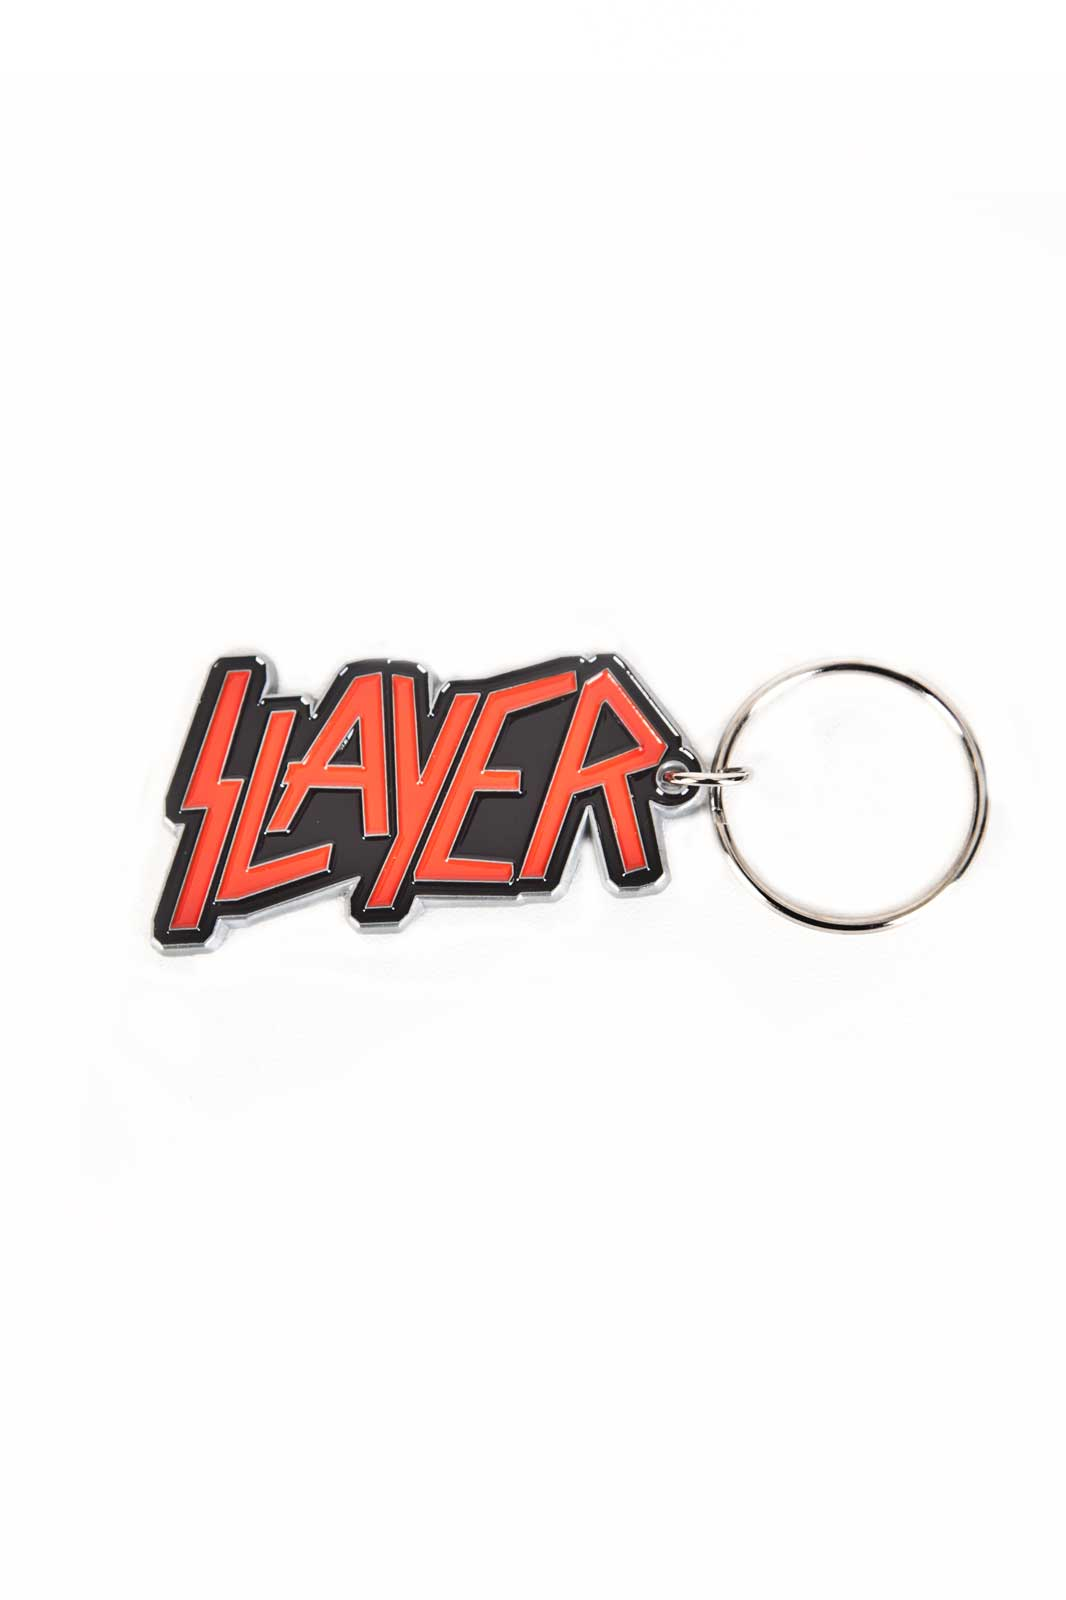 official merchandise slayer keyring